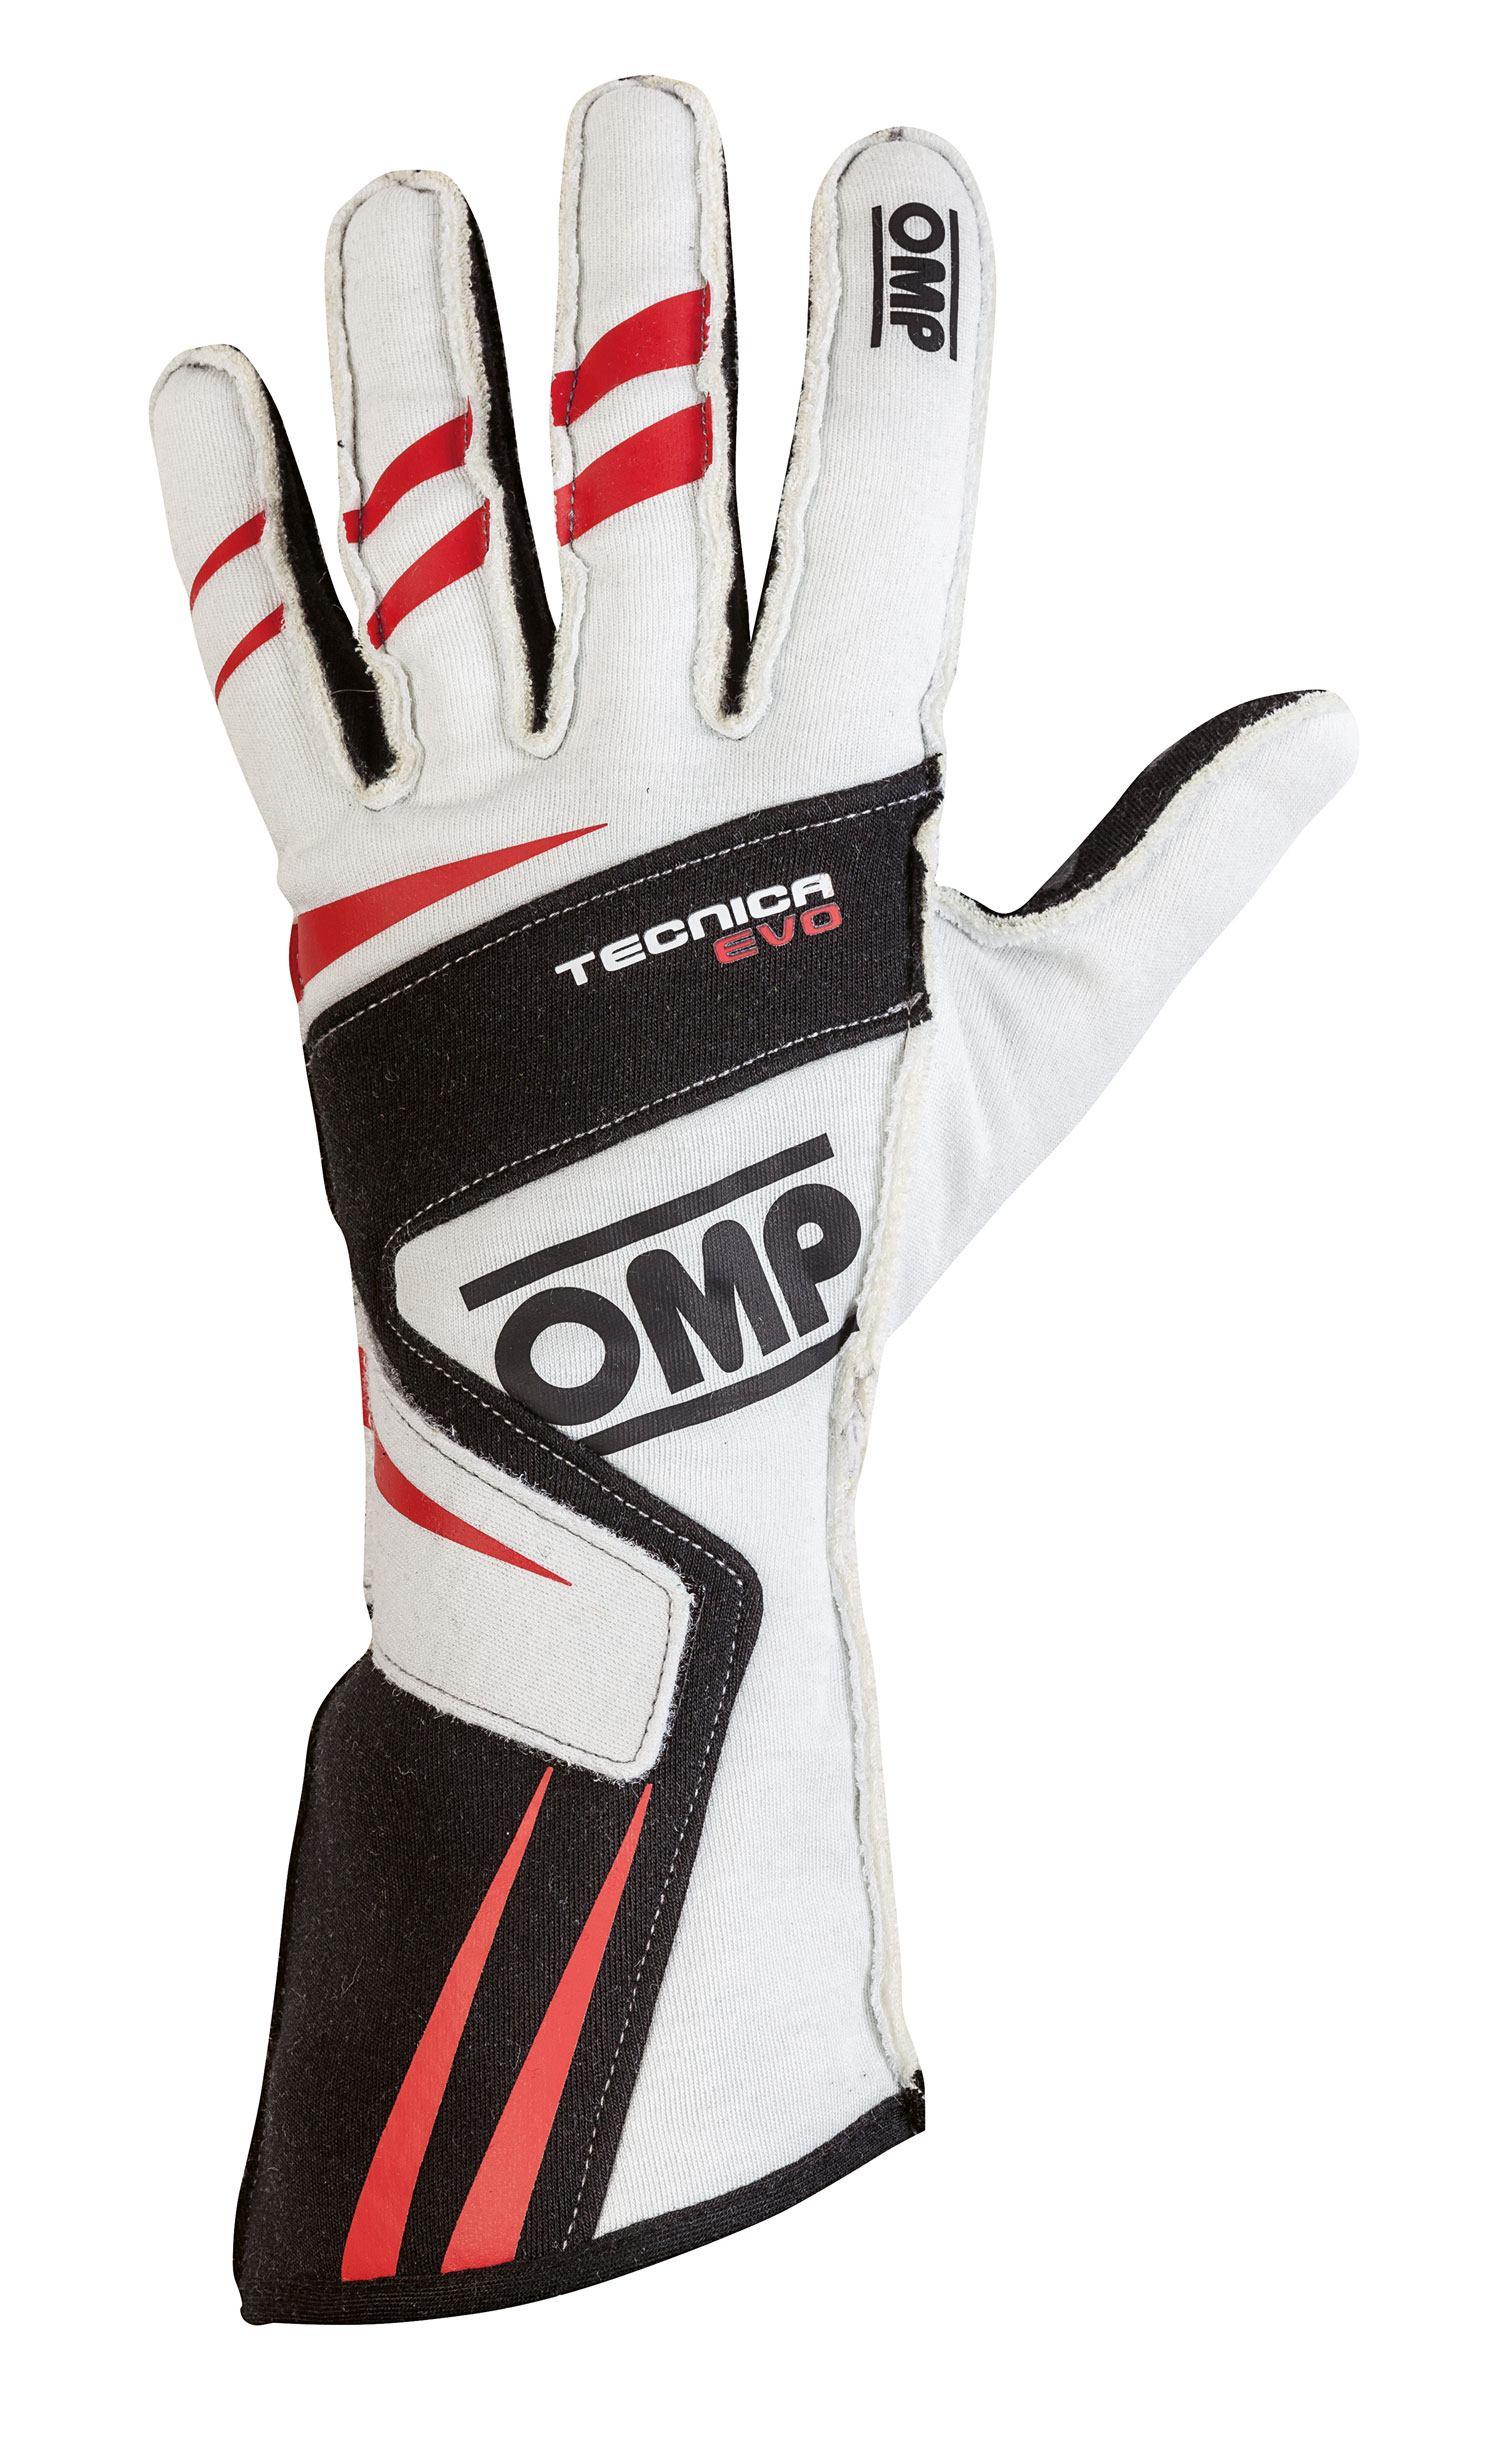 OMP Fahrerhandschuh Tecnica Evo, weiß/schwarz